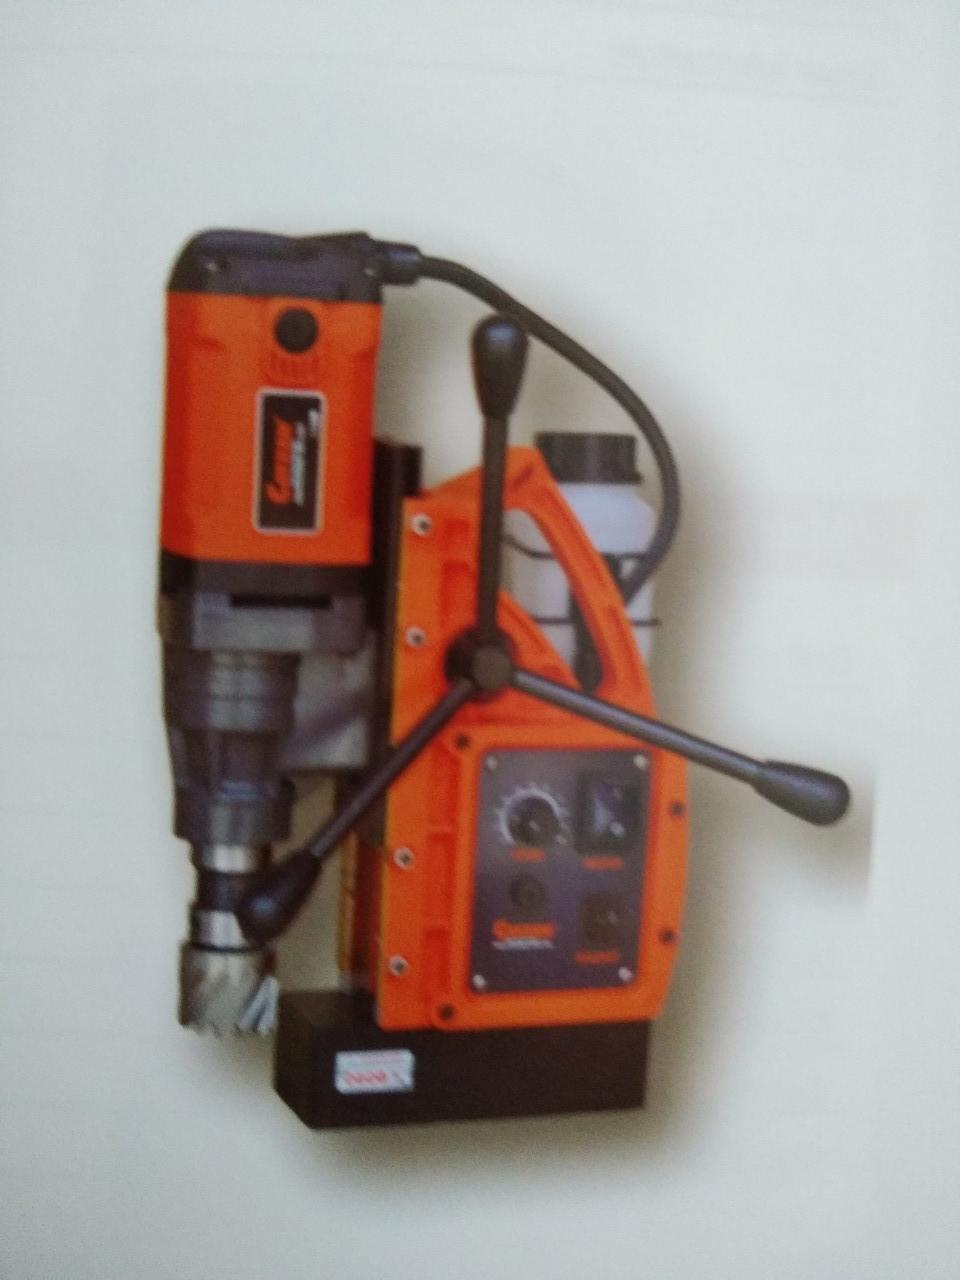 Магнитная дрель по металлу, cayken SCY-50HD